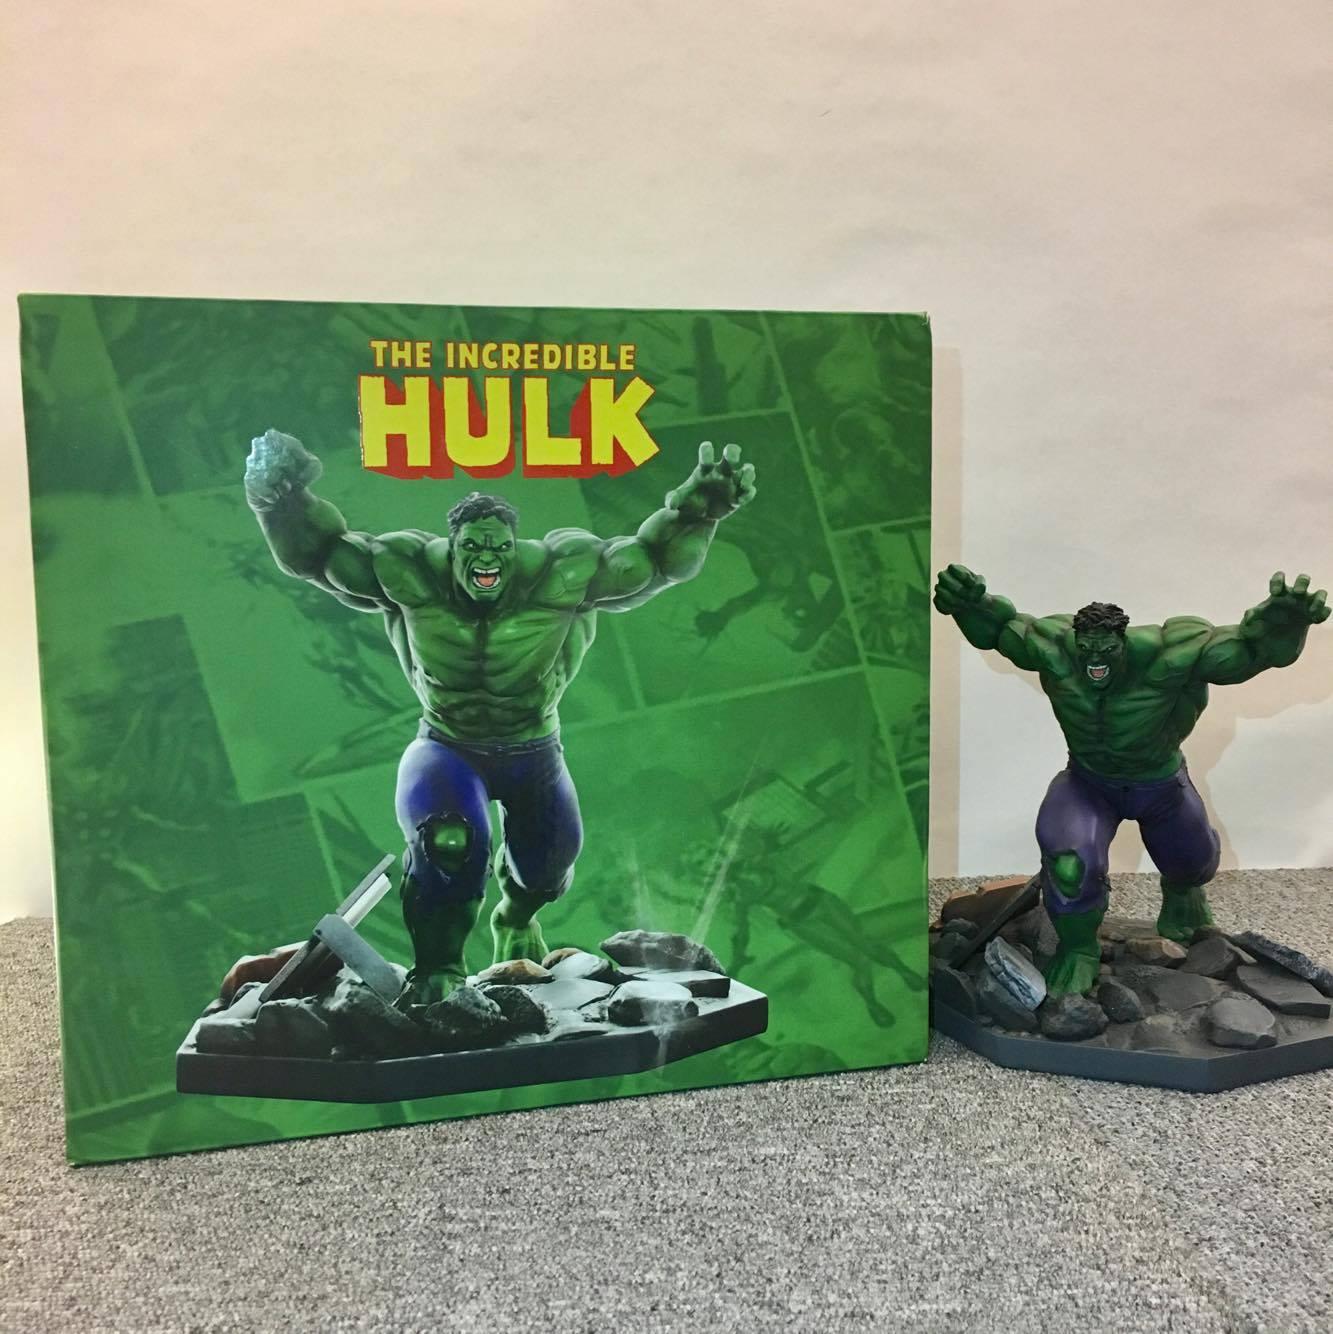 BEETLE 全新 BAIT x MARVEL HULK 綠巨人浩克 復仇者聯盟 公仔 玩偶 聖誕禮物 3